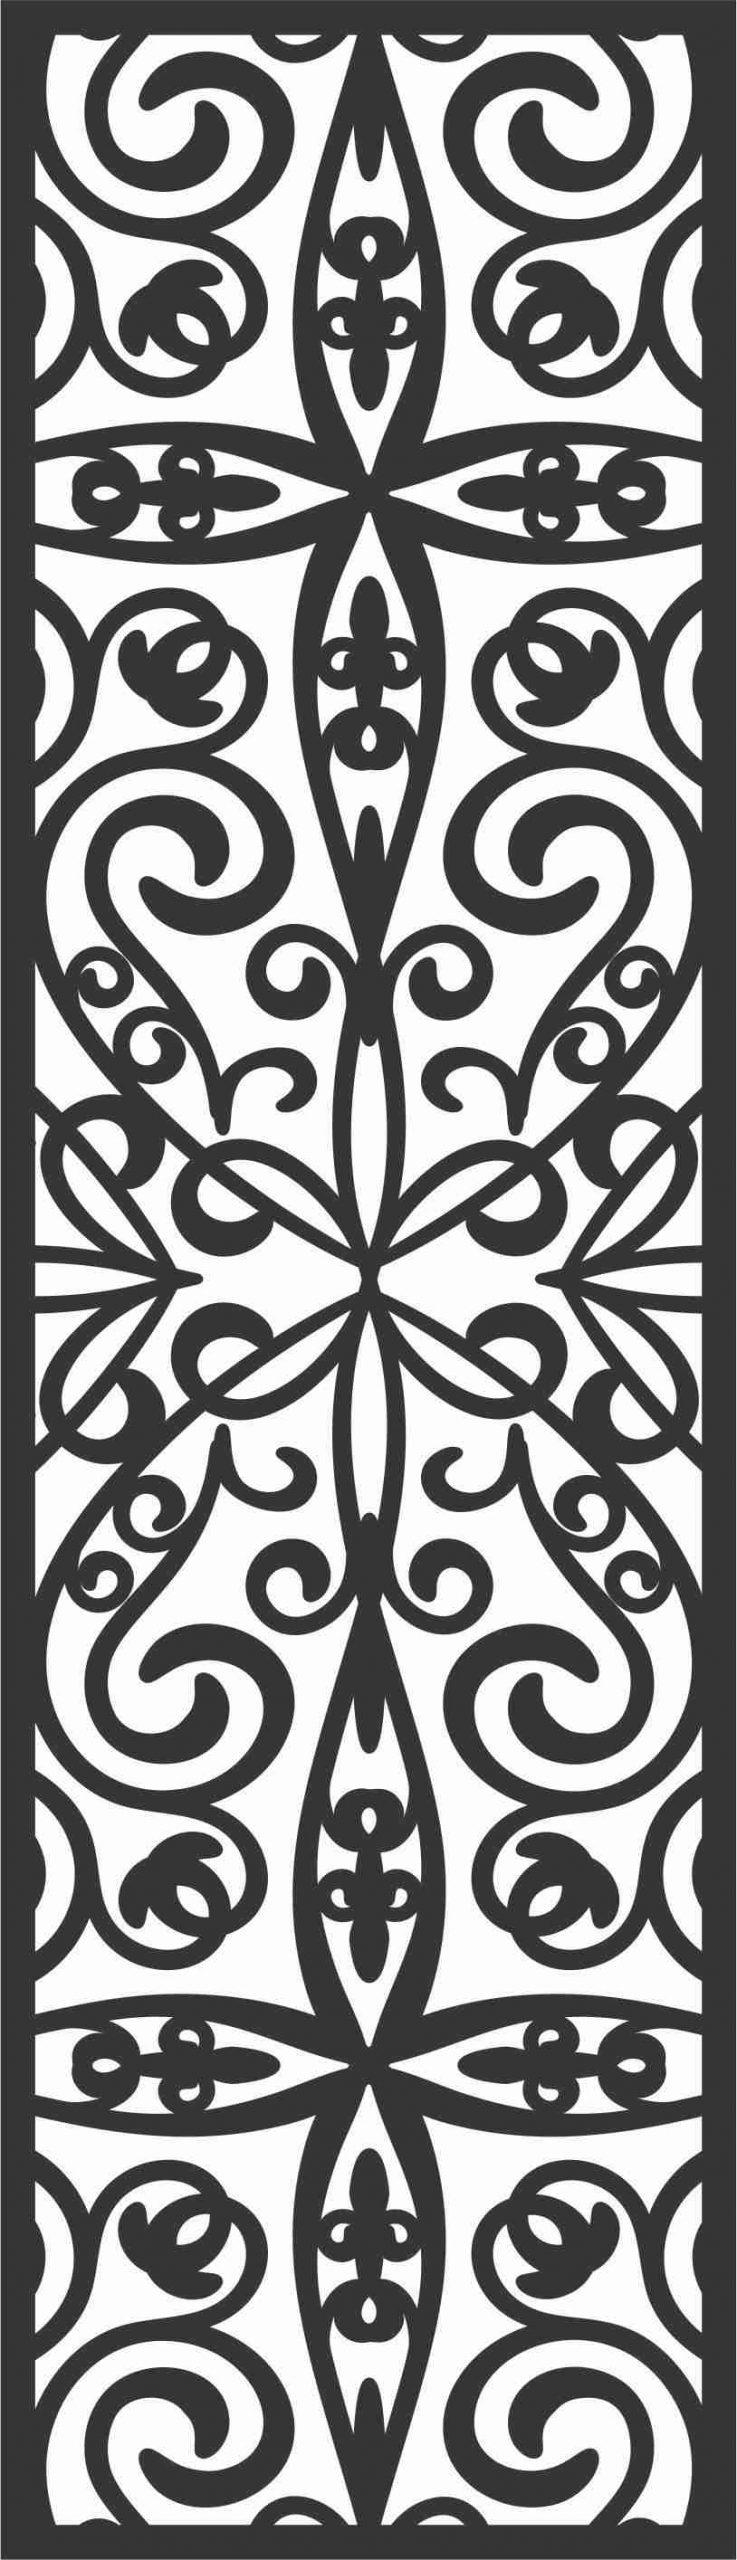 Screen Panel Patterns Seamless 34 Free DXF File